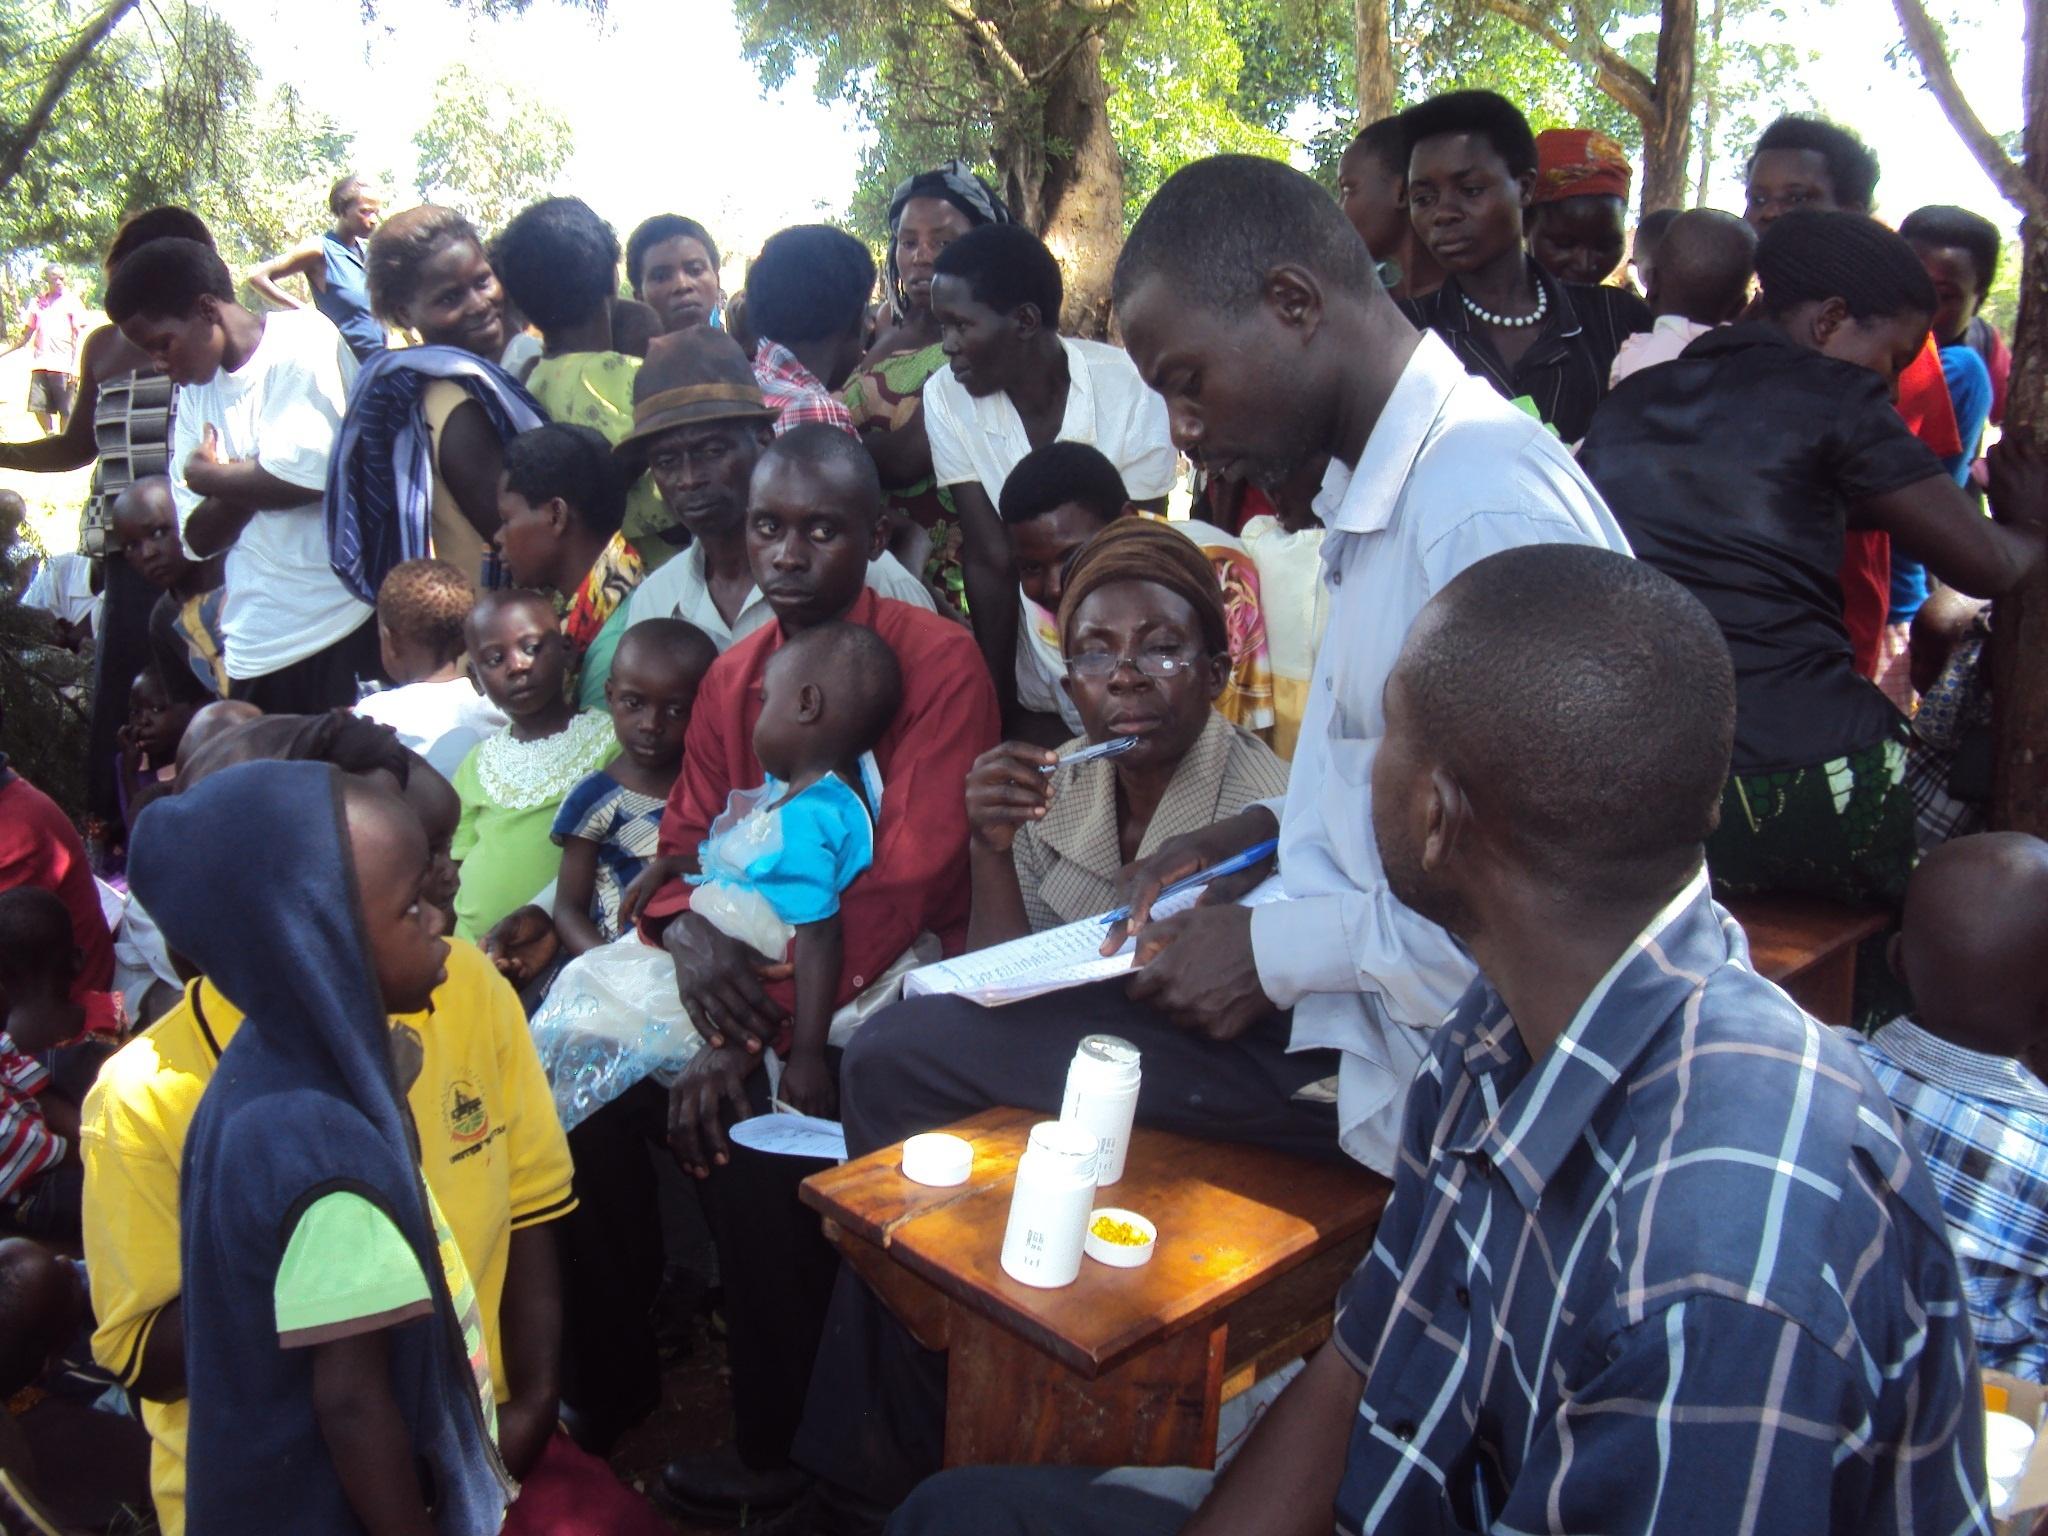 Clínica Baviera suministrará vitamina A a 2.000 niños en Uganda para prevenir la ceguera